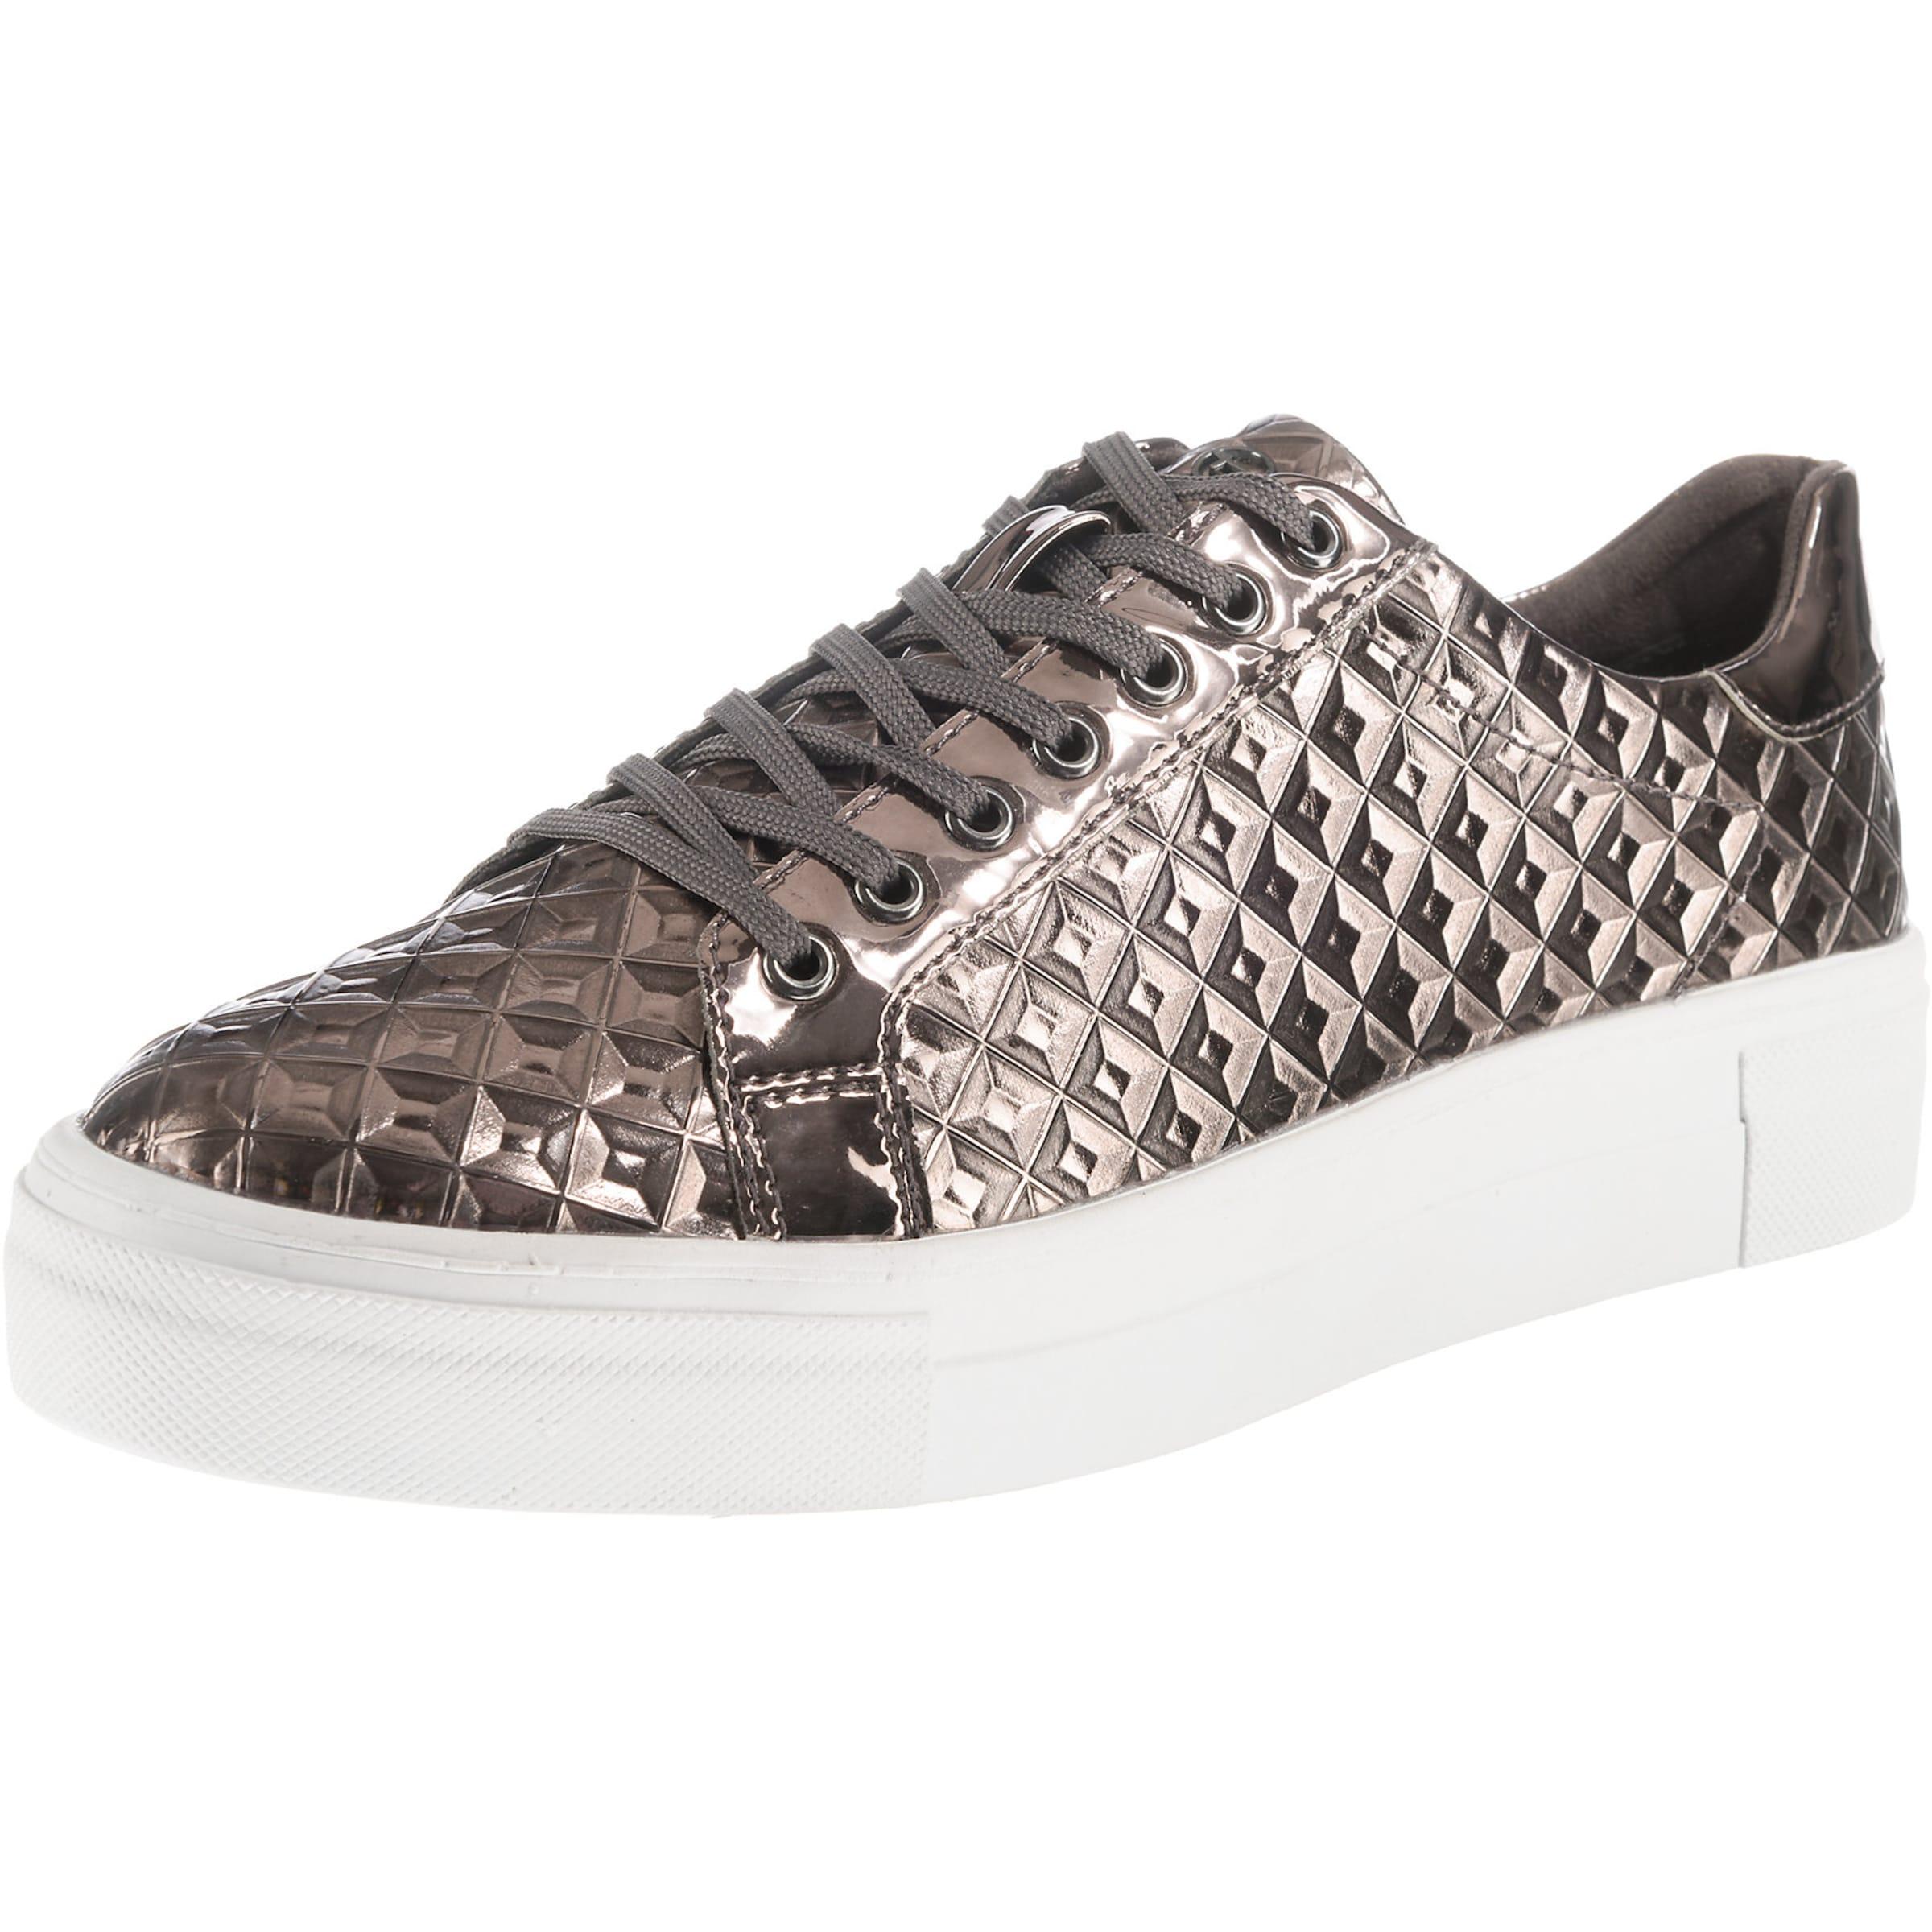 In PastellpinkSilber Weiß Sneakers Tamaris Rq34A5jL